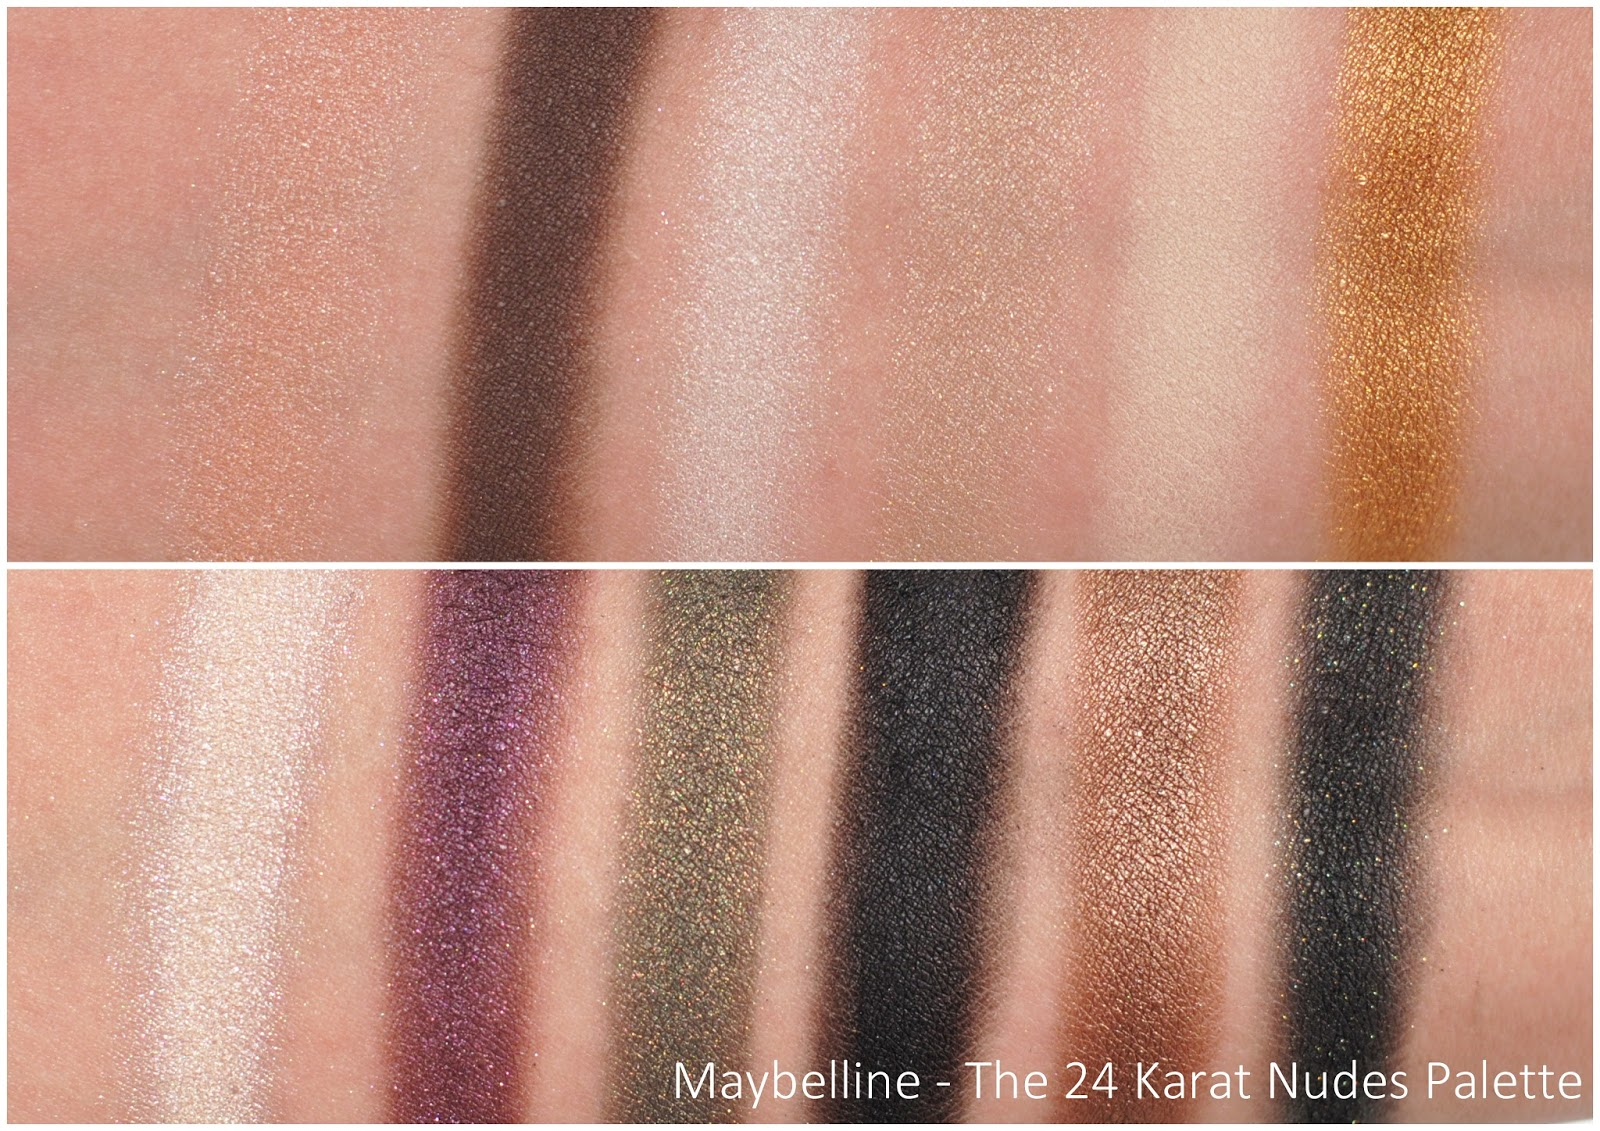 Maybelline 24 Karat Nudes review